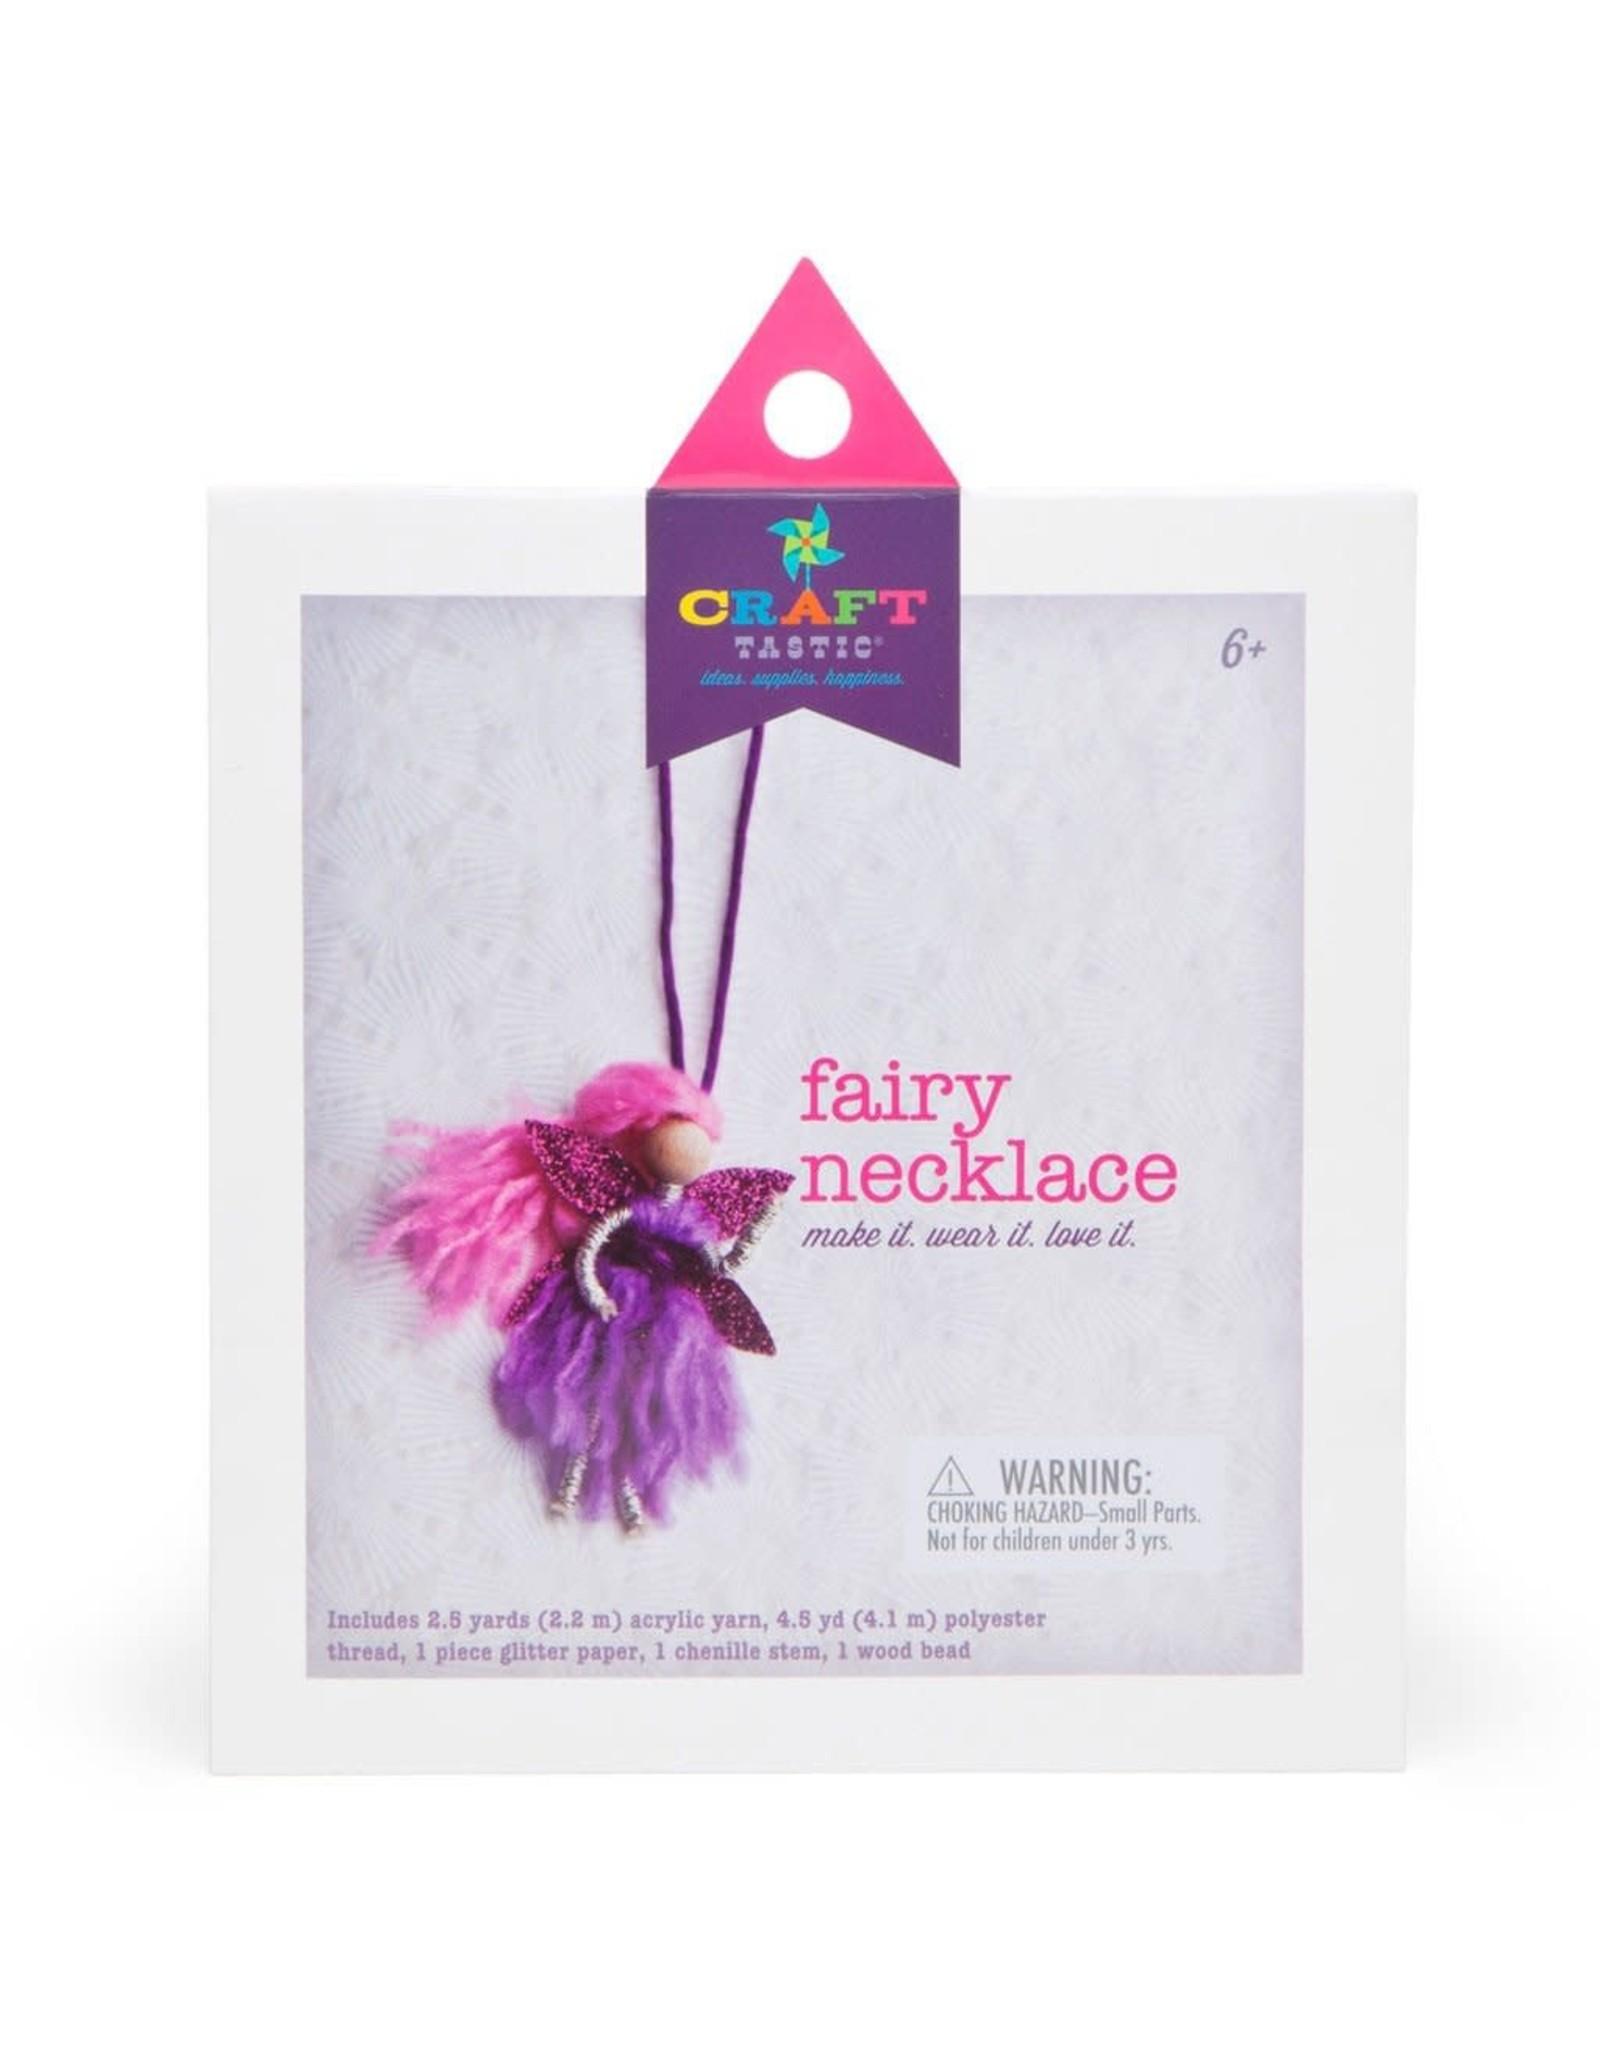 ANN WILLIAMS GROUP Craft-tastic Fairy Necklace Kit